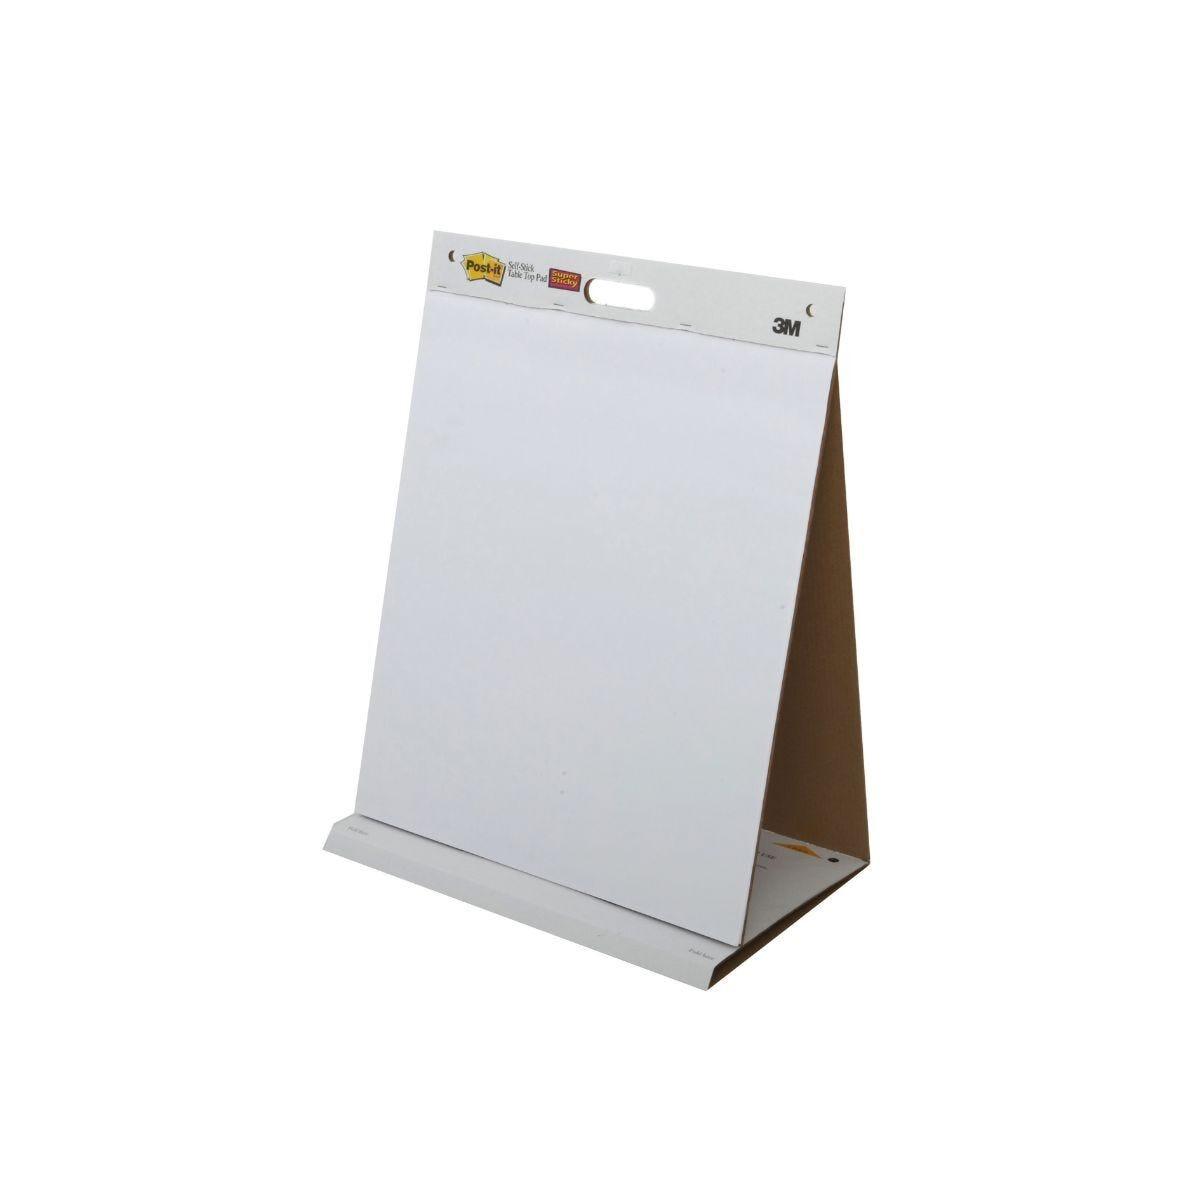 3M Post-It Flip Chart Pad 20 Sheets